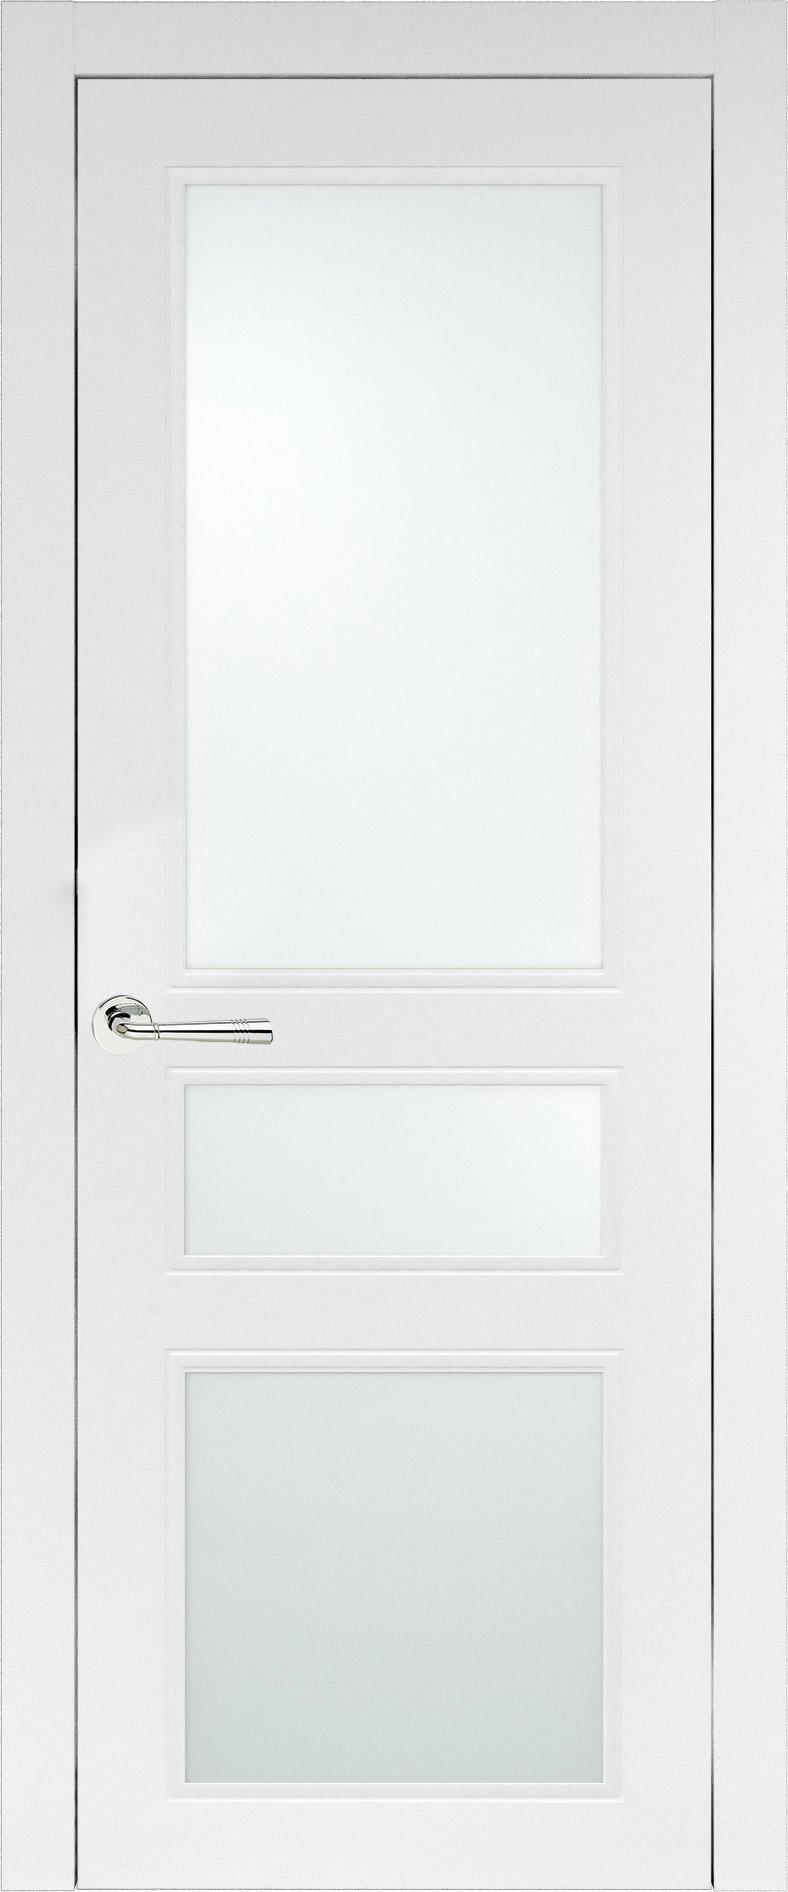 Imperia-R Neo Classic цвет - Белая эмаль (RAL 9003) Со стеклом (ДО)